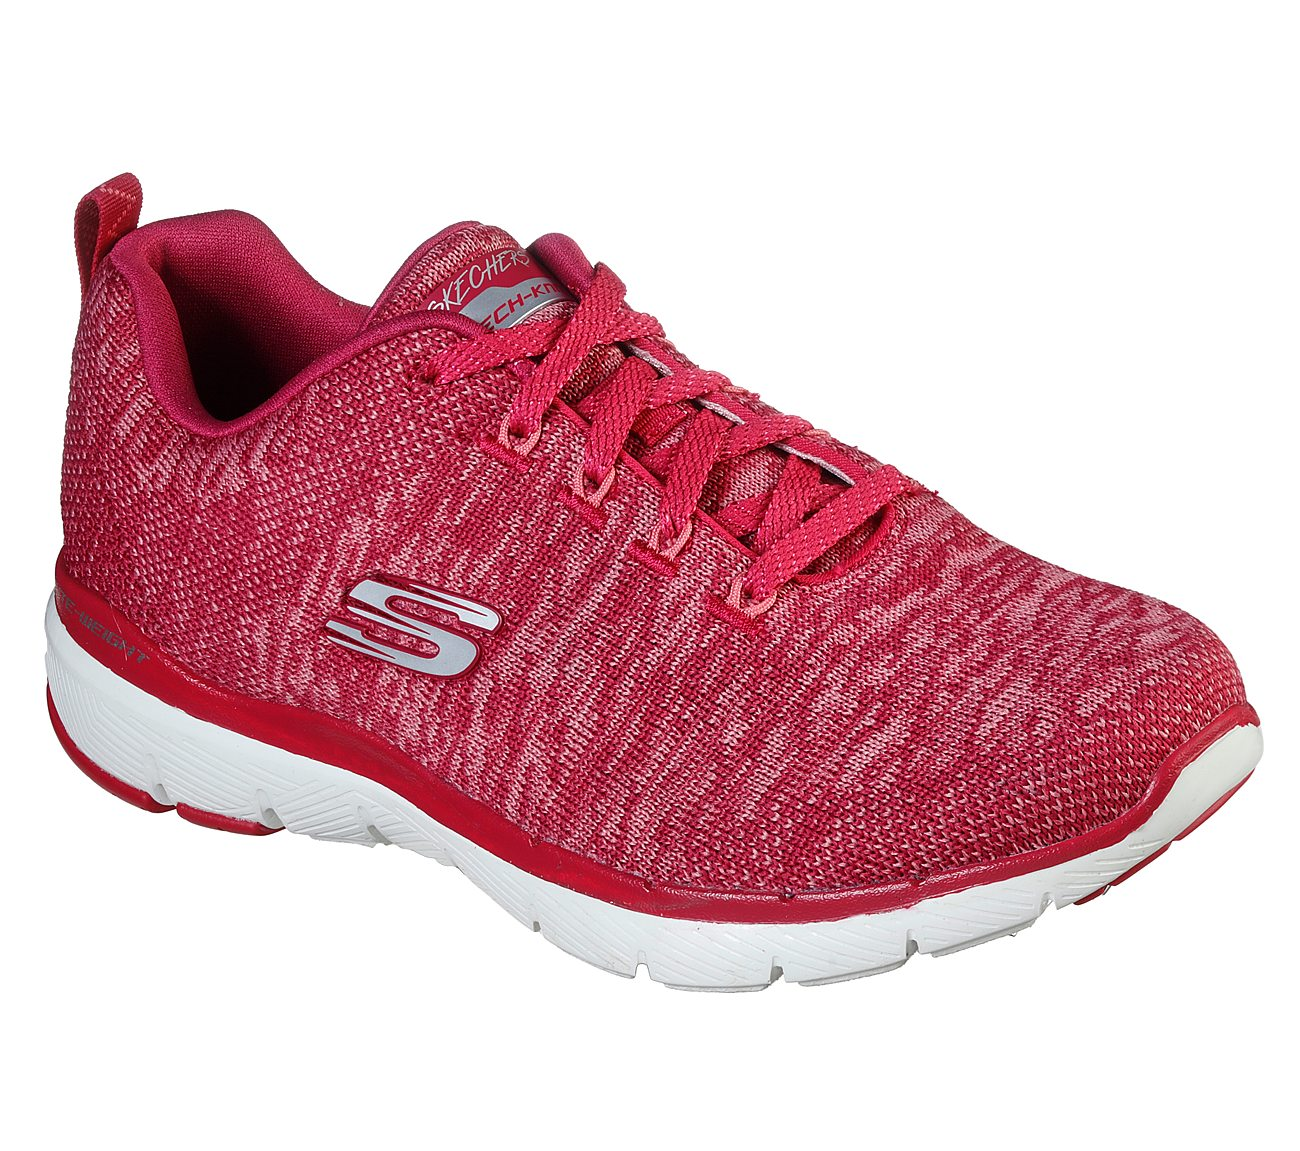 Skechers Flex Appeal 3.0 13062, Zapatillas para Mujer